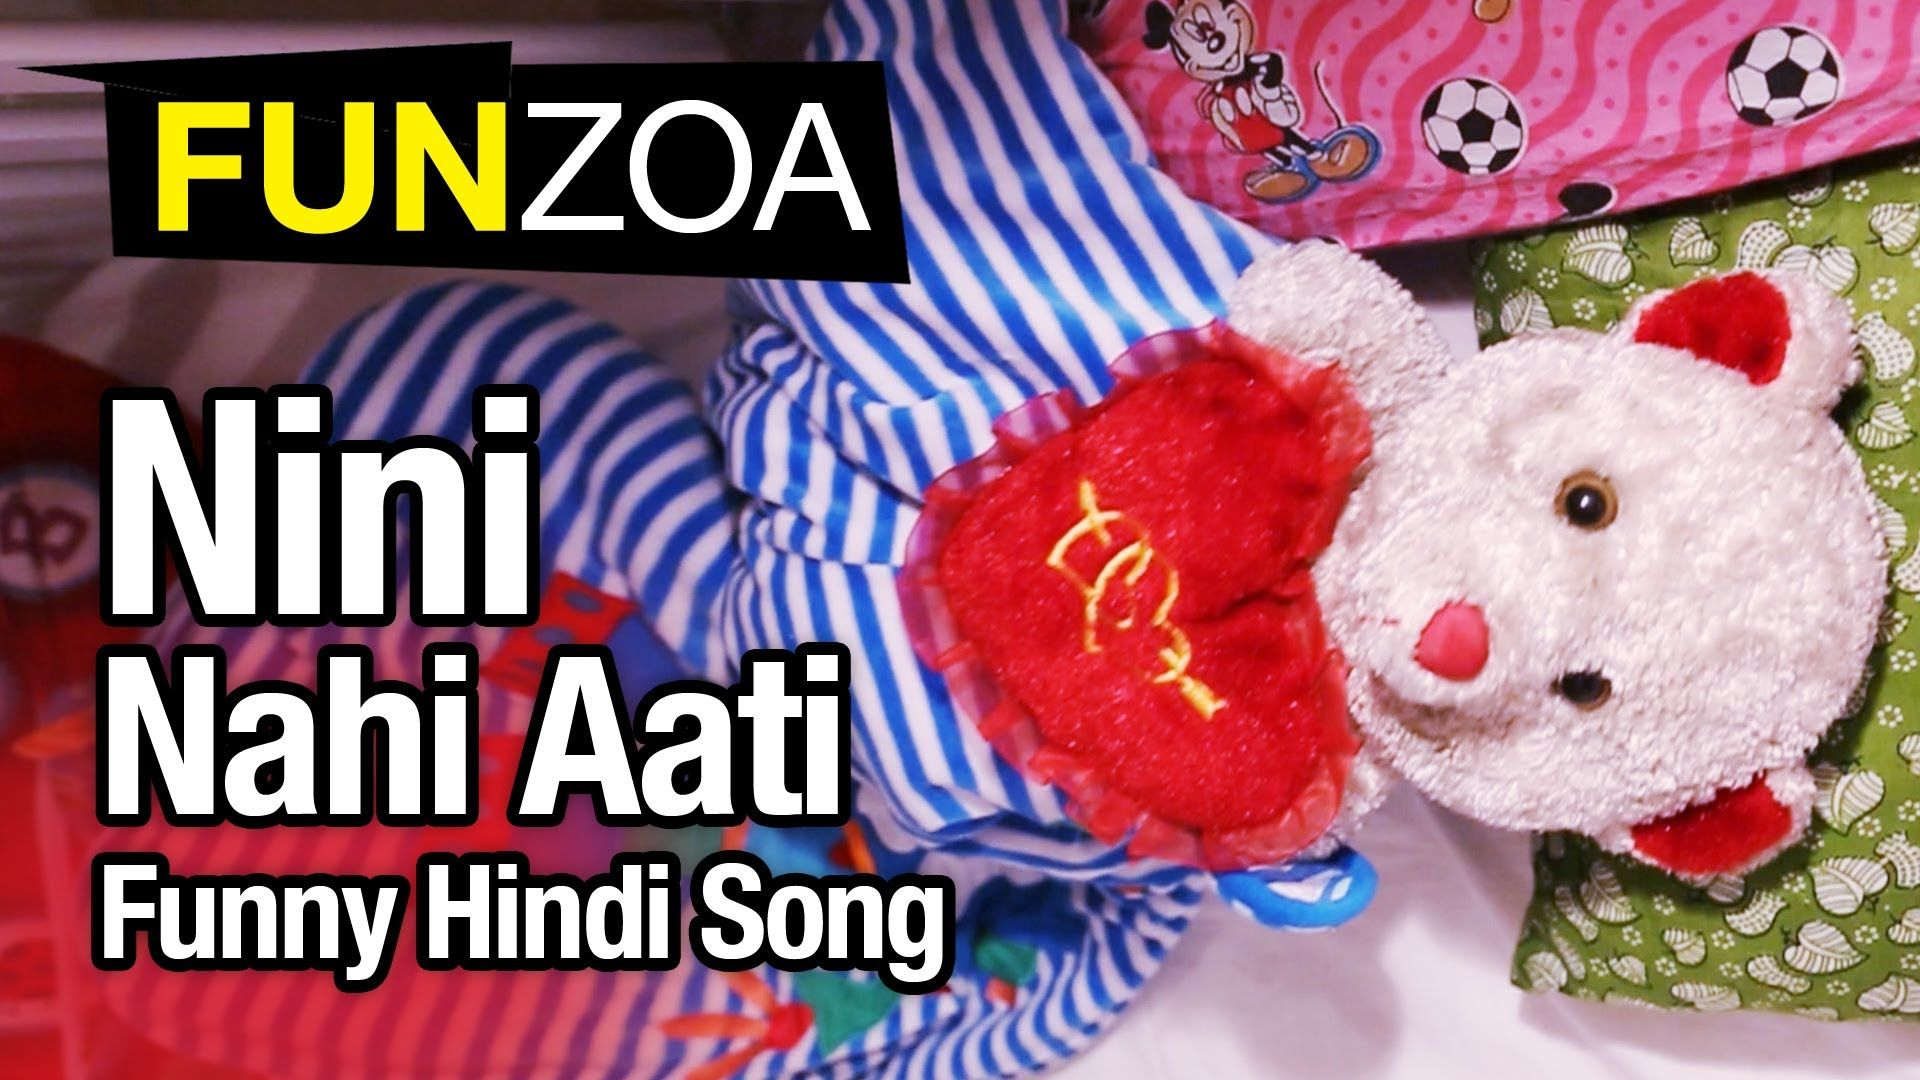 Nini Nahi Aati-Funny Hindi Love Song By Funzoa Teddy Bear